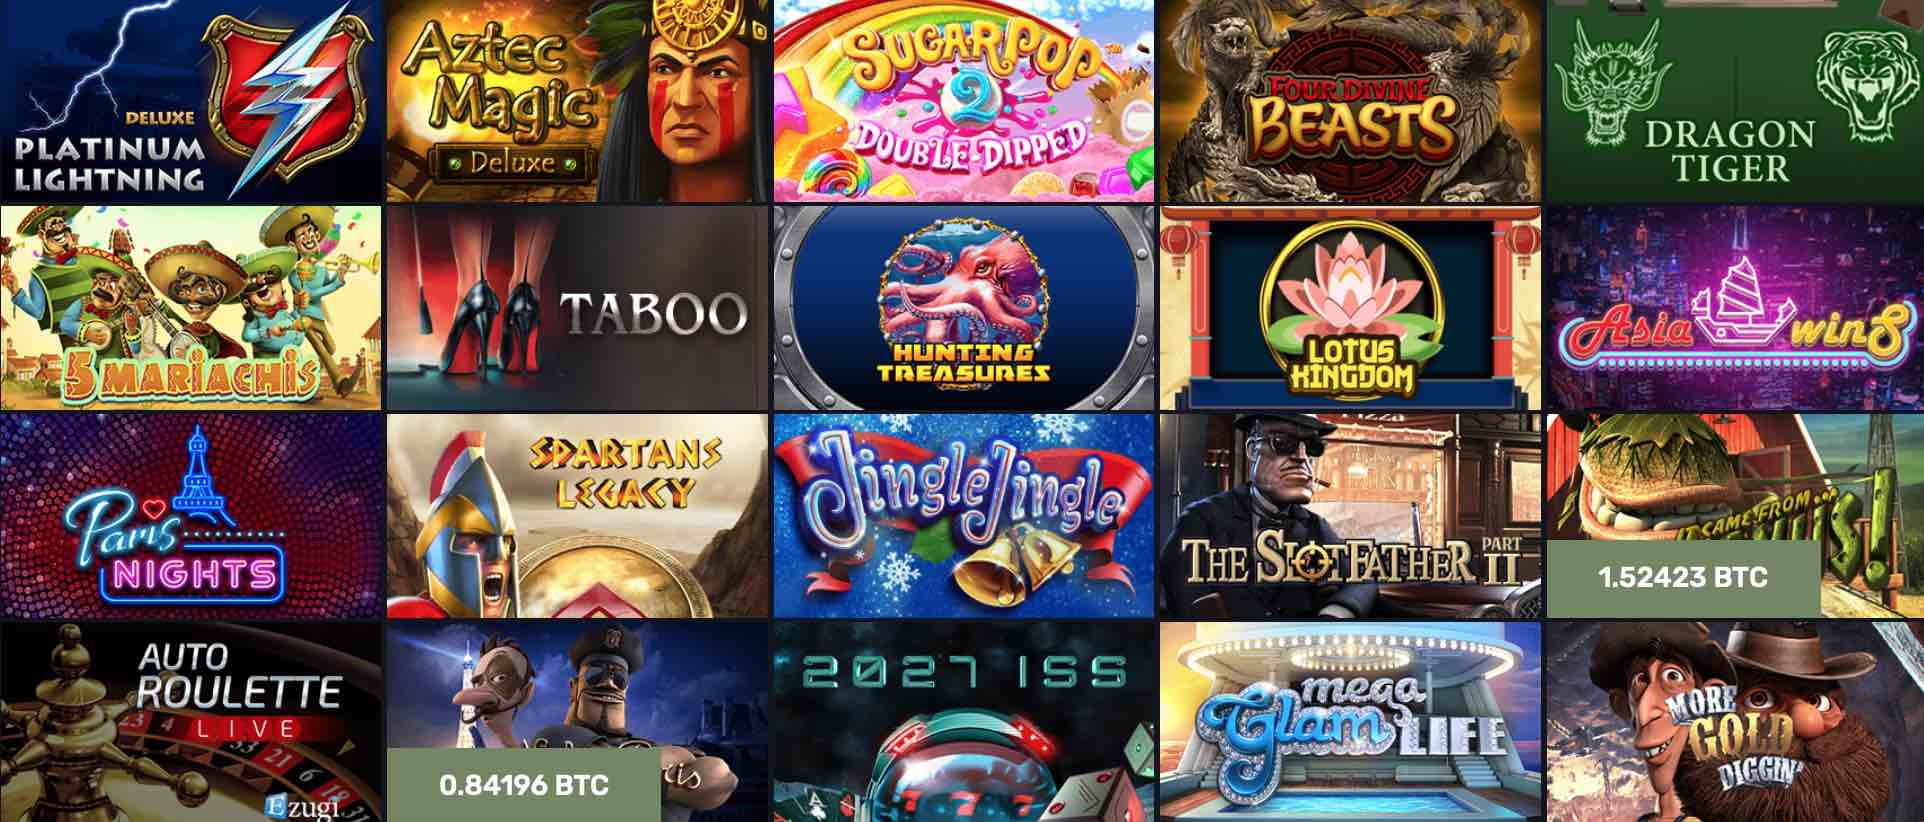 Online bitcoin casino bitcoin roulette erfahrungen